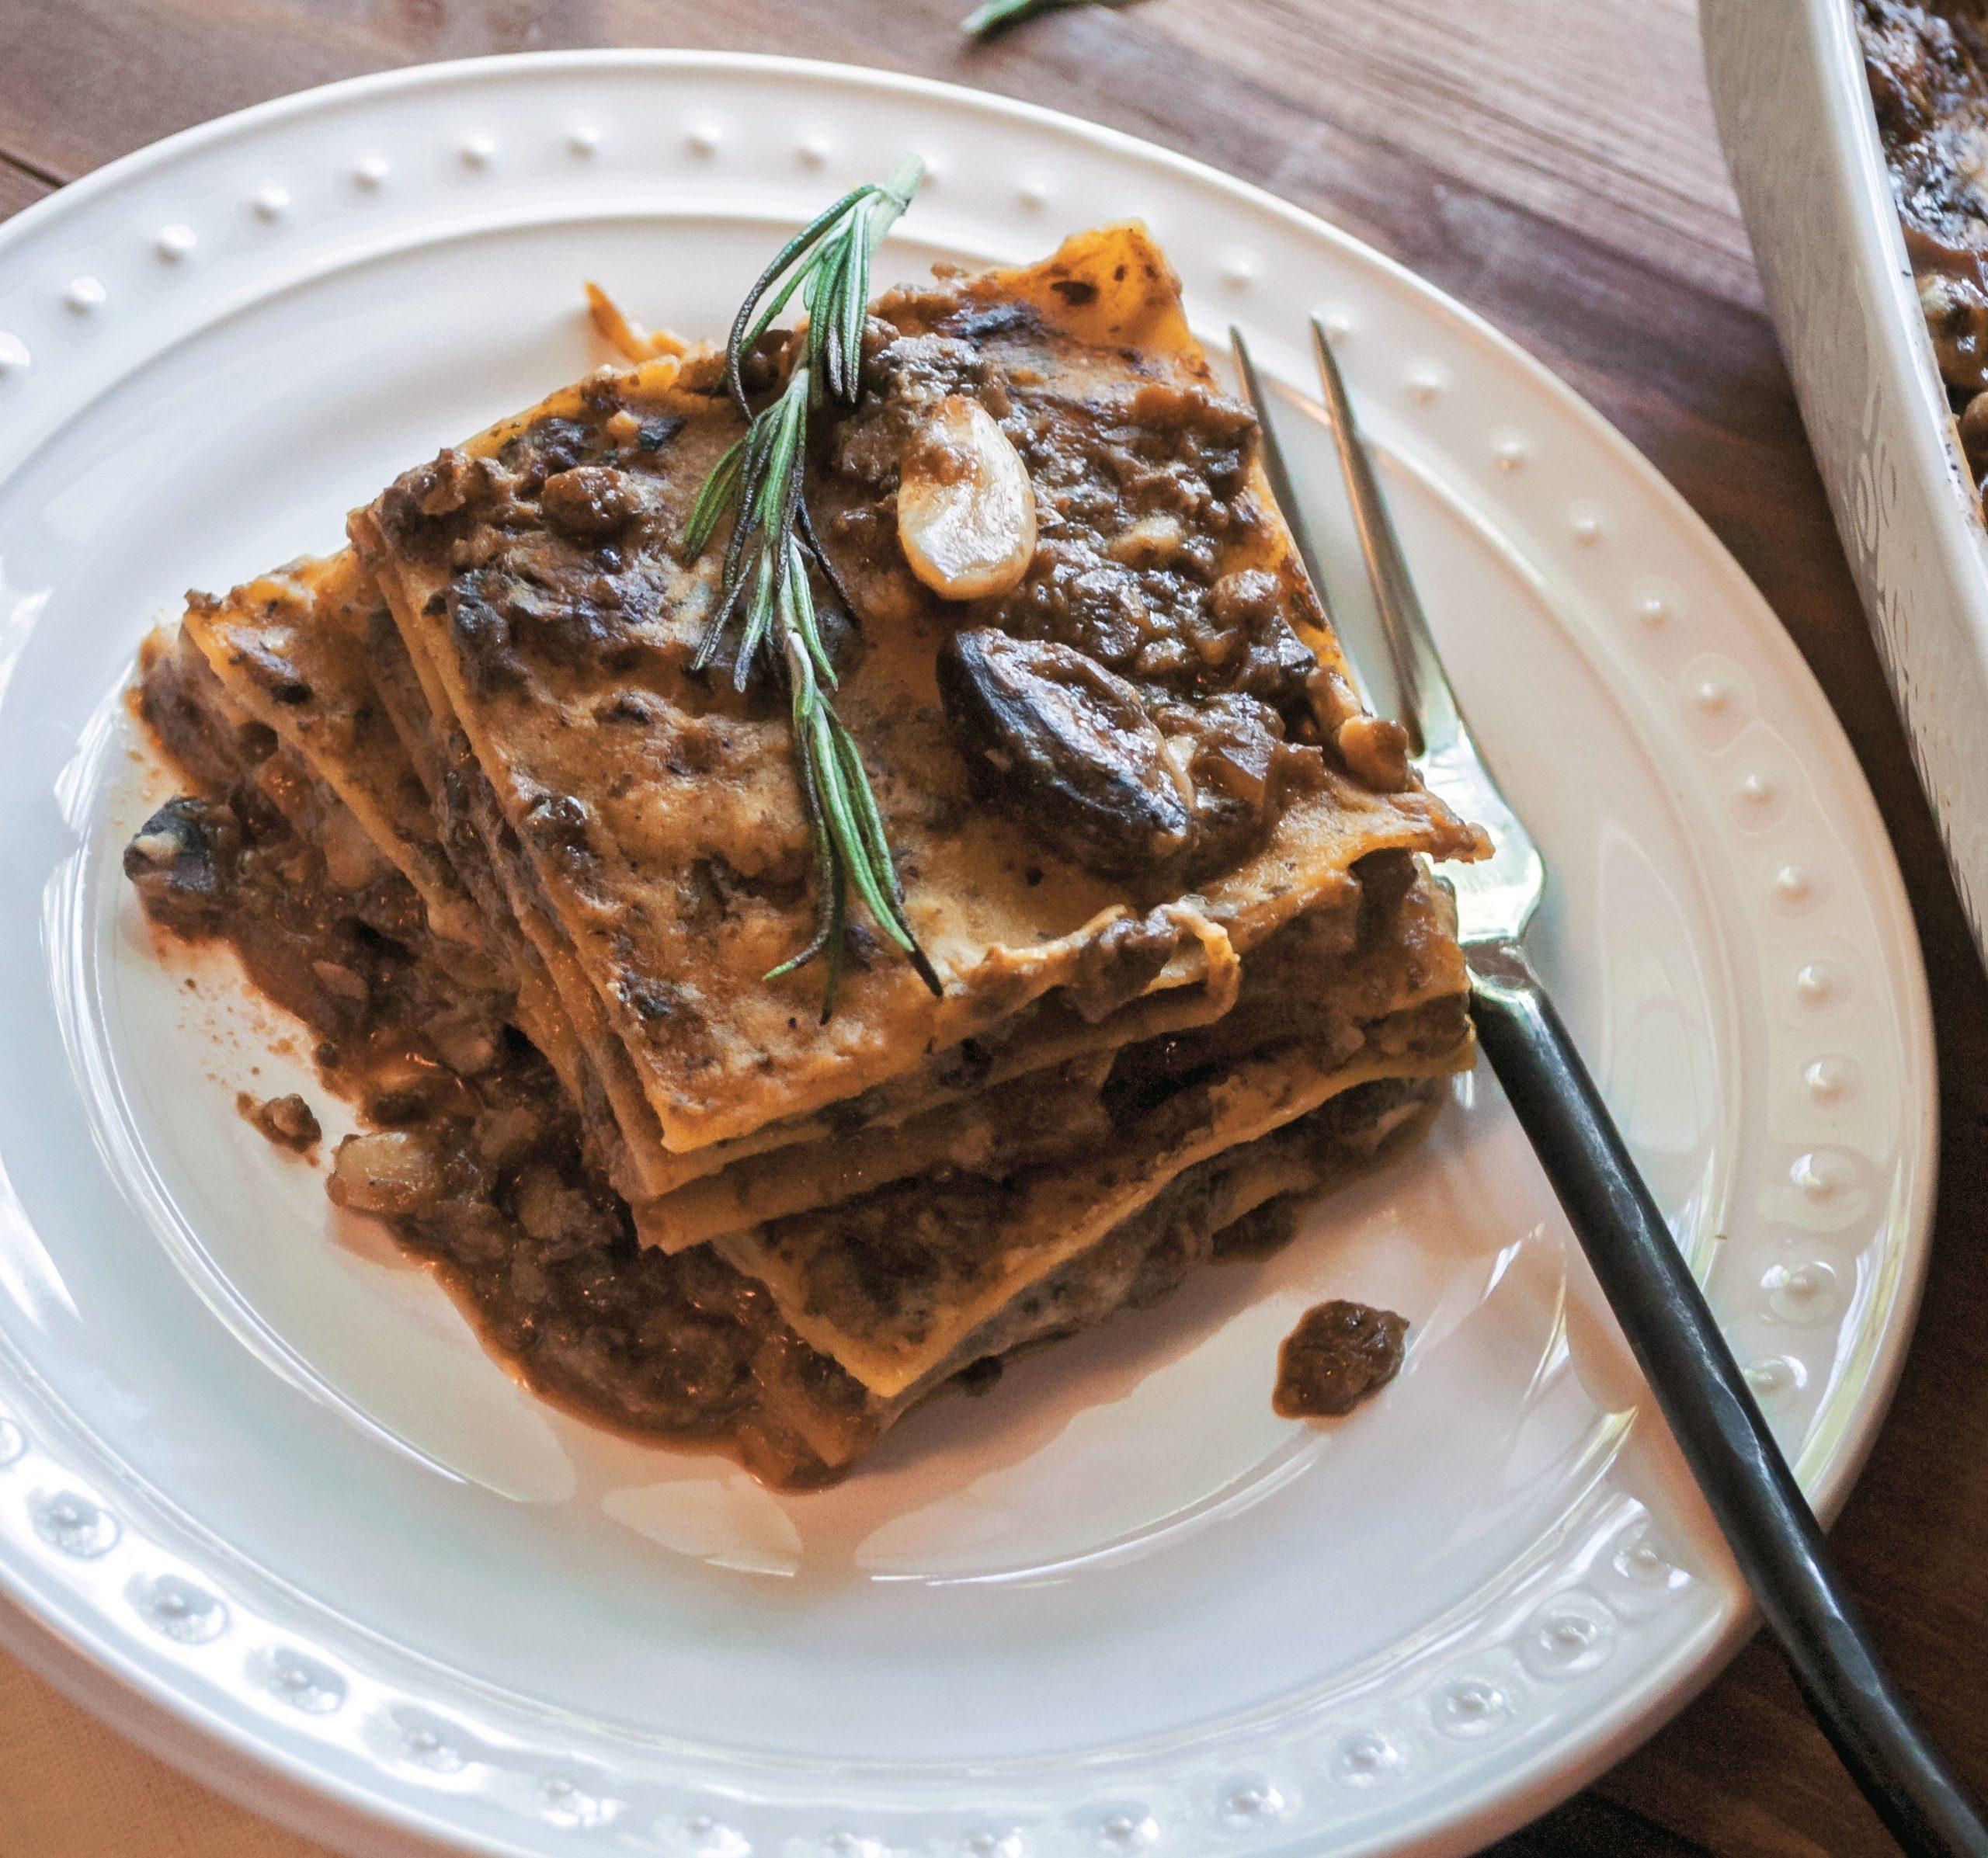 Barbecue Mushroom Lasagna